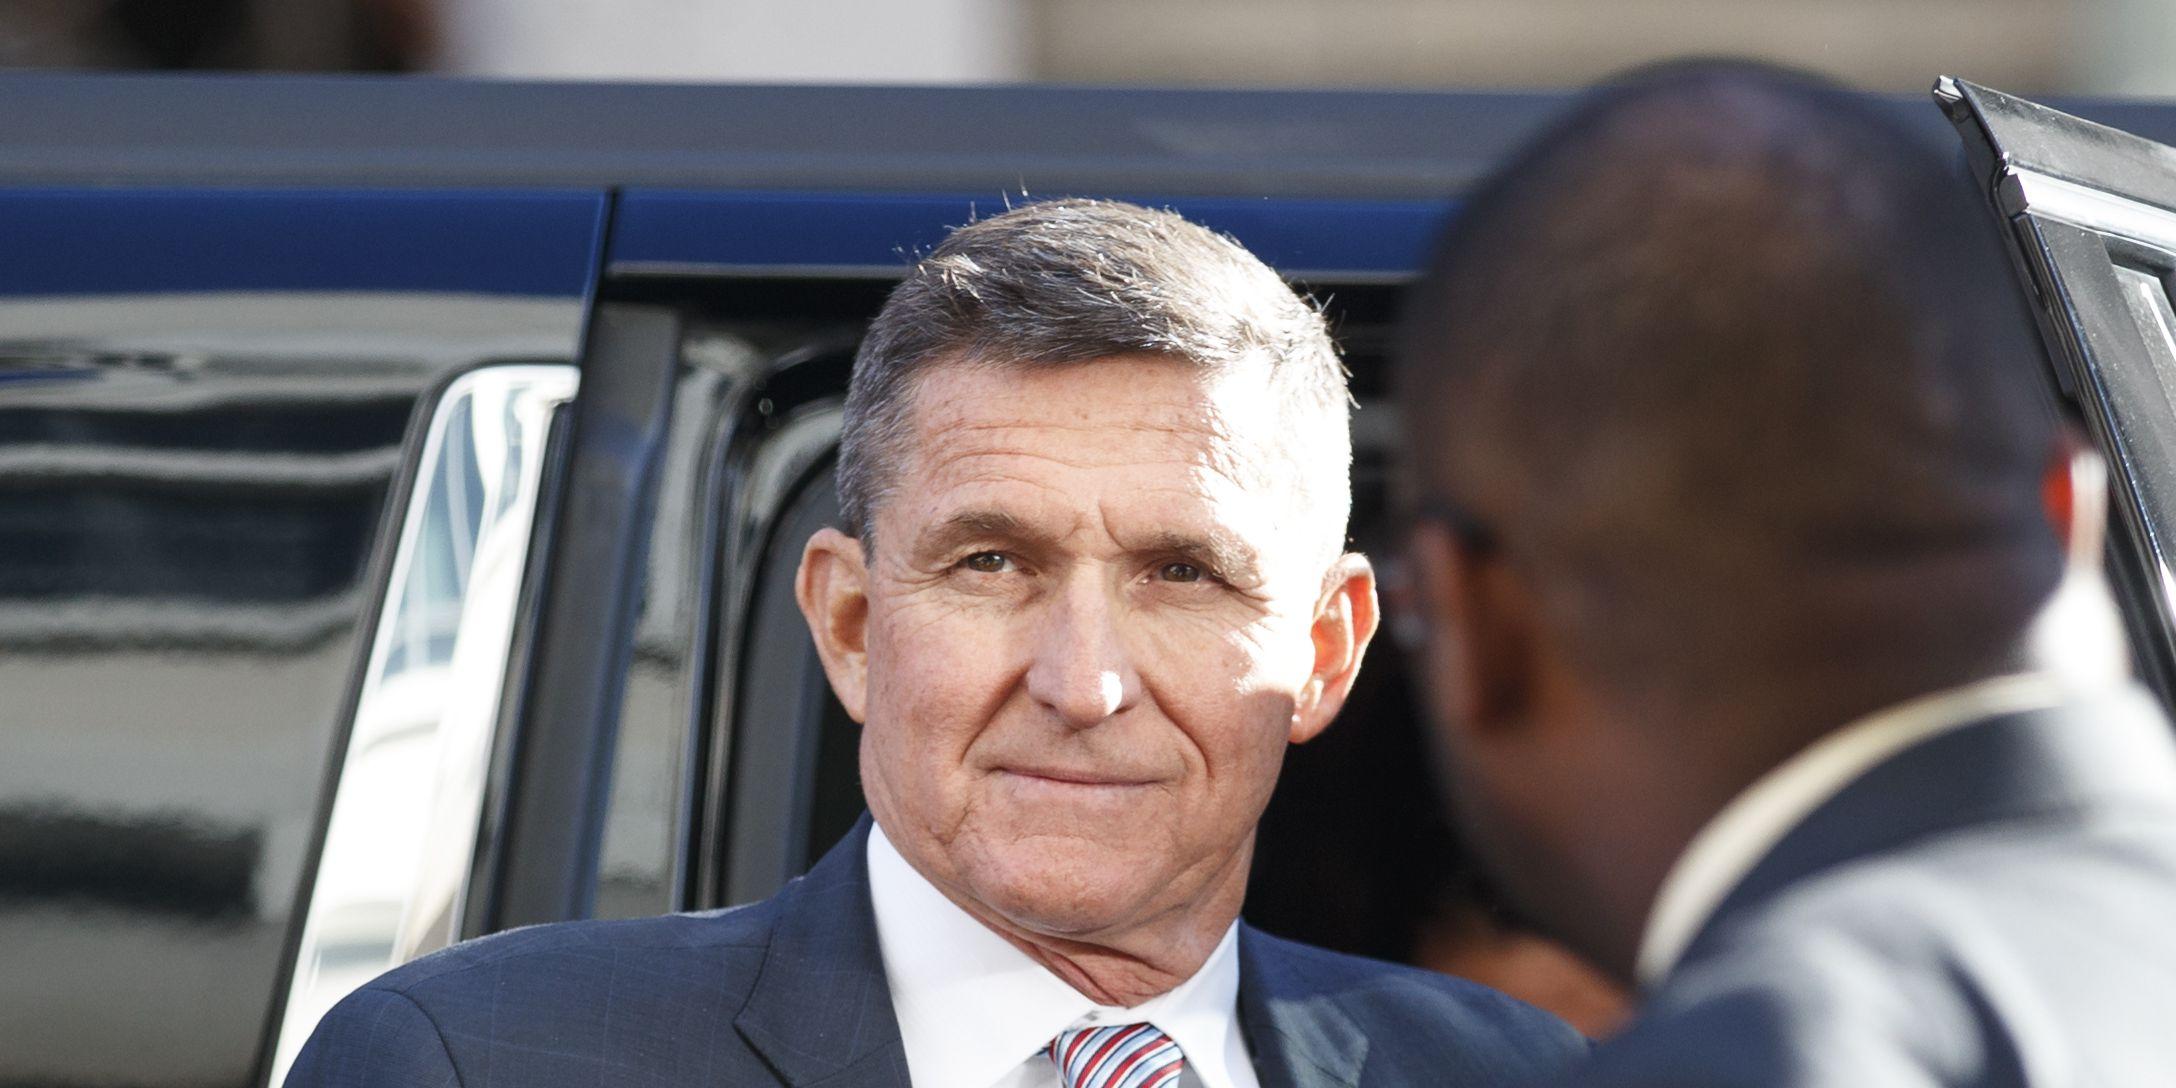 Ex-Trump aide Michael Flynn seeks to withdraw guilty plea